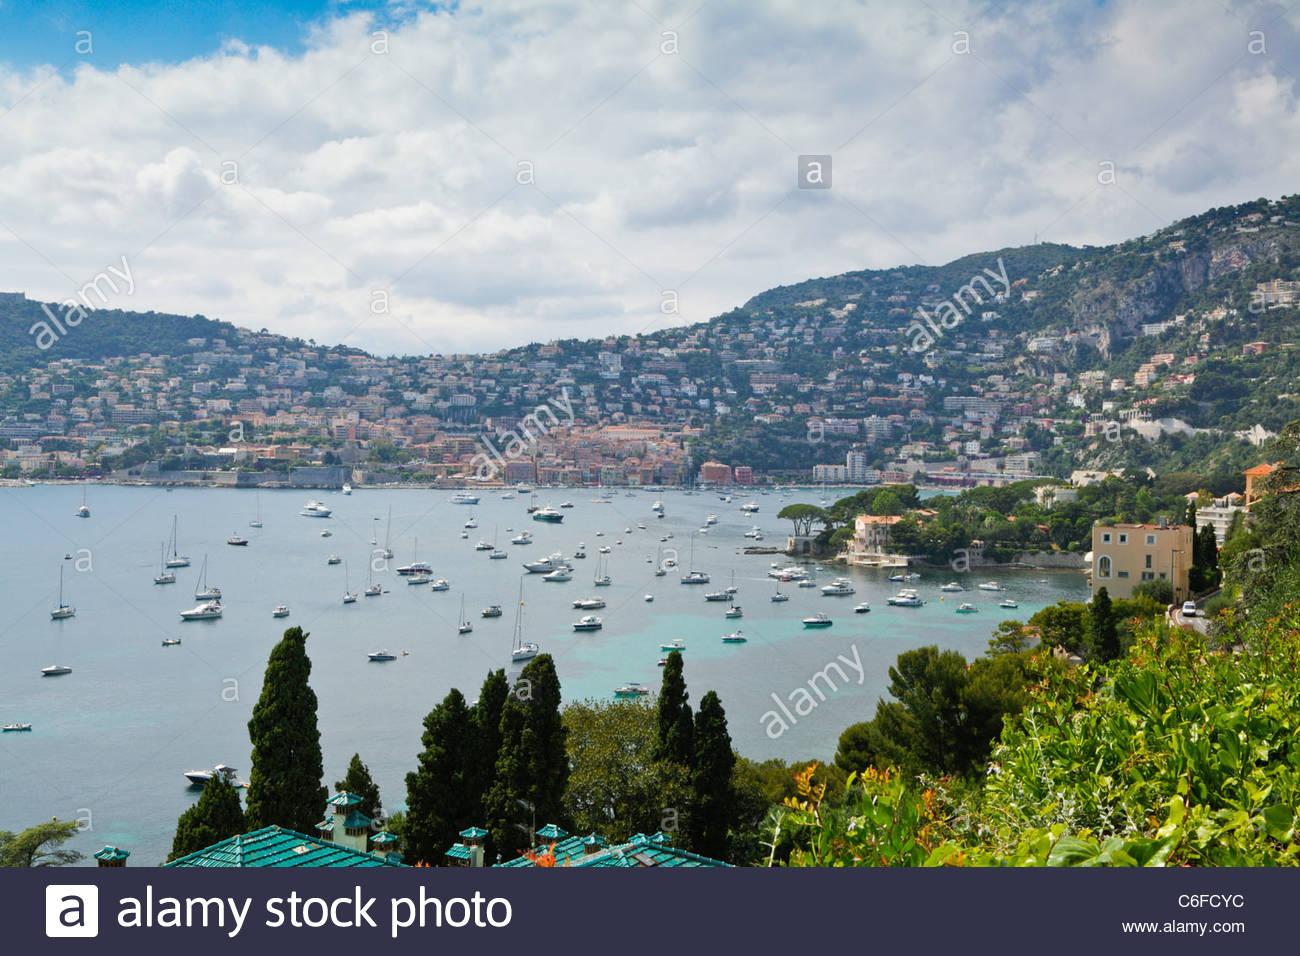 Vista verso Villefranche-sur-mer da St-Jean-Cap-Ferrat, Cote D'Azur, in Francia. Foto Stock